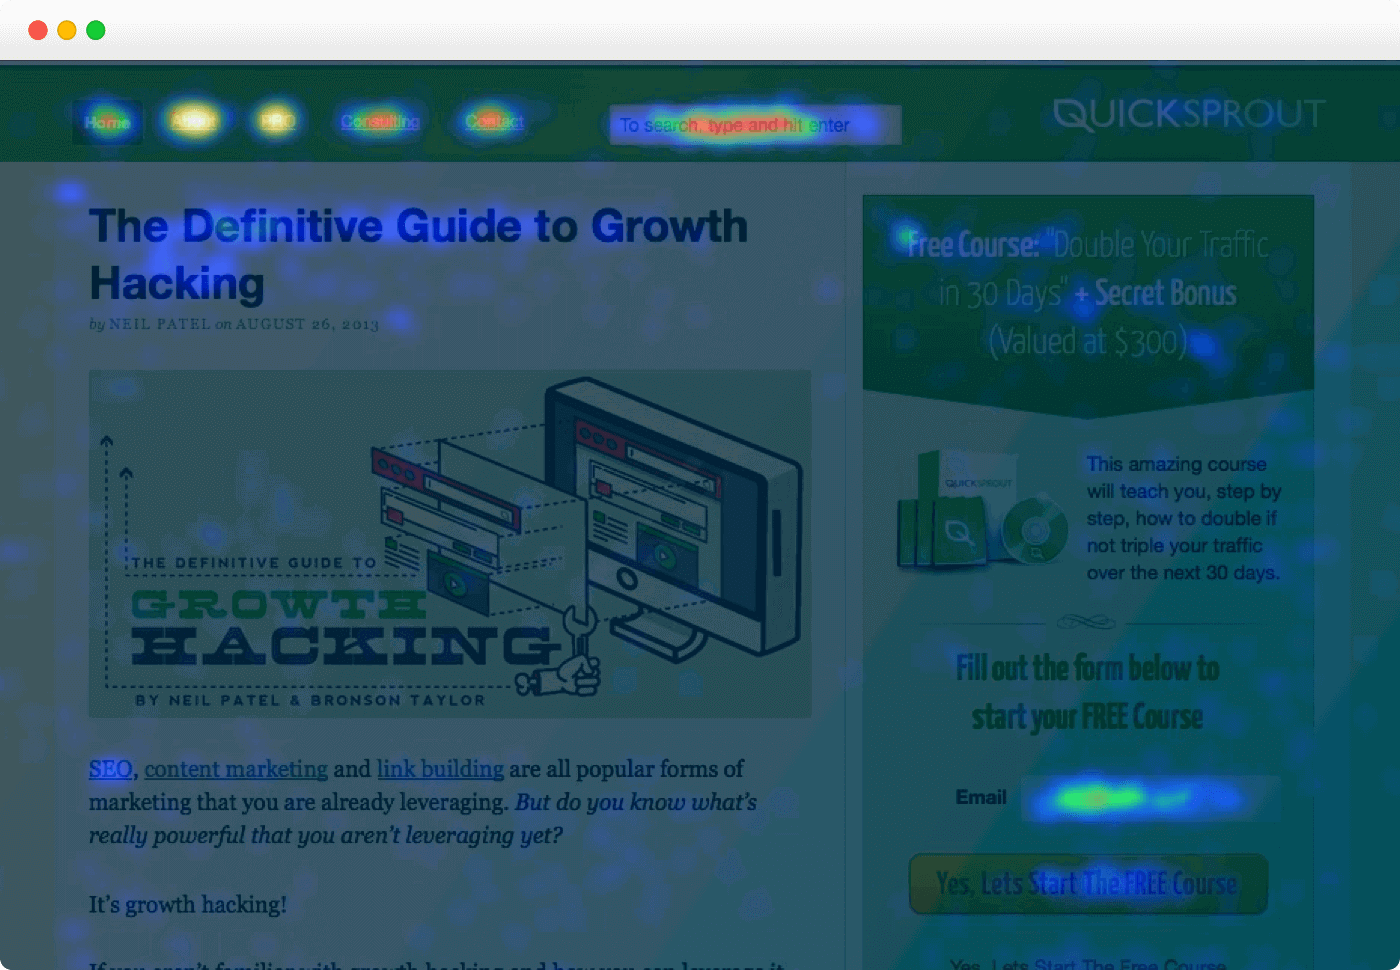 crazyegg landing page tool